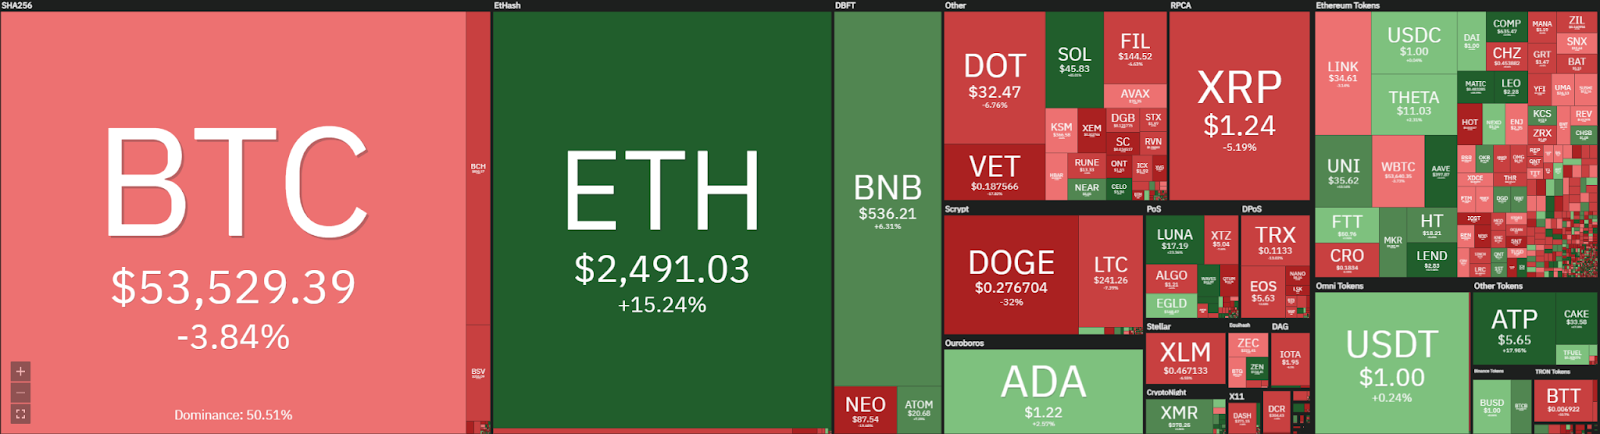 Weekly Crypto Price Analysis 26th Apr